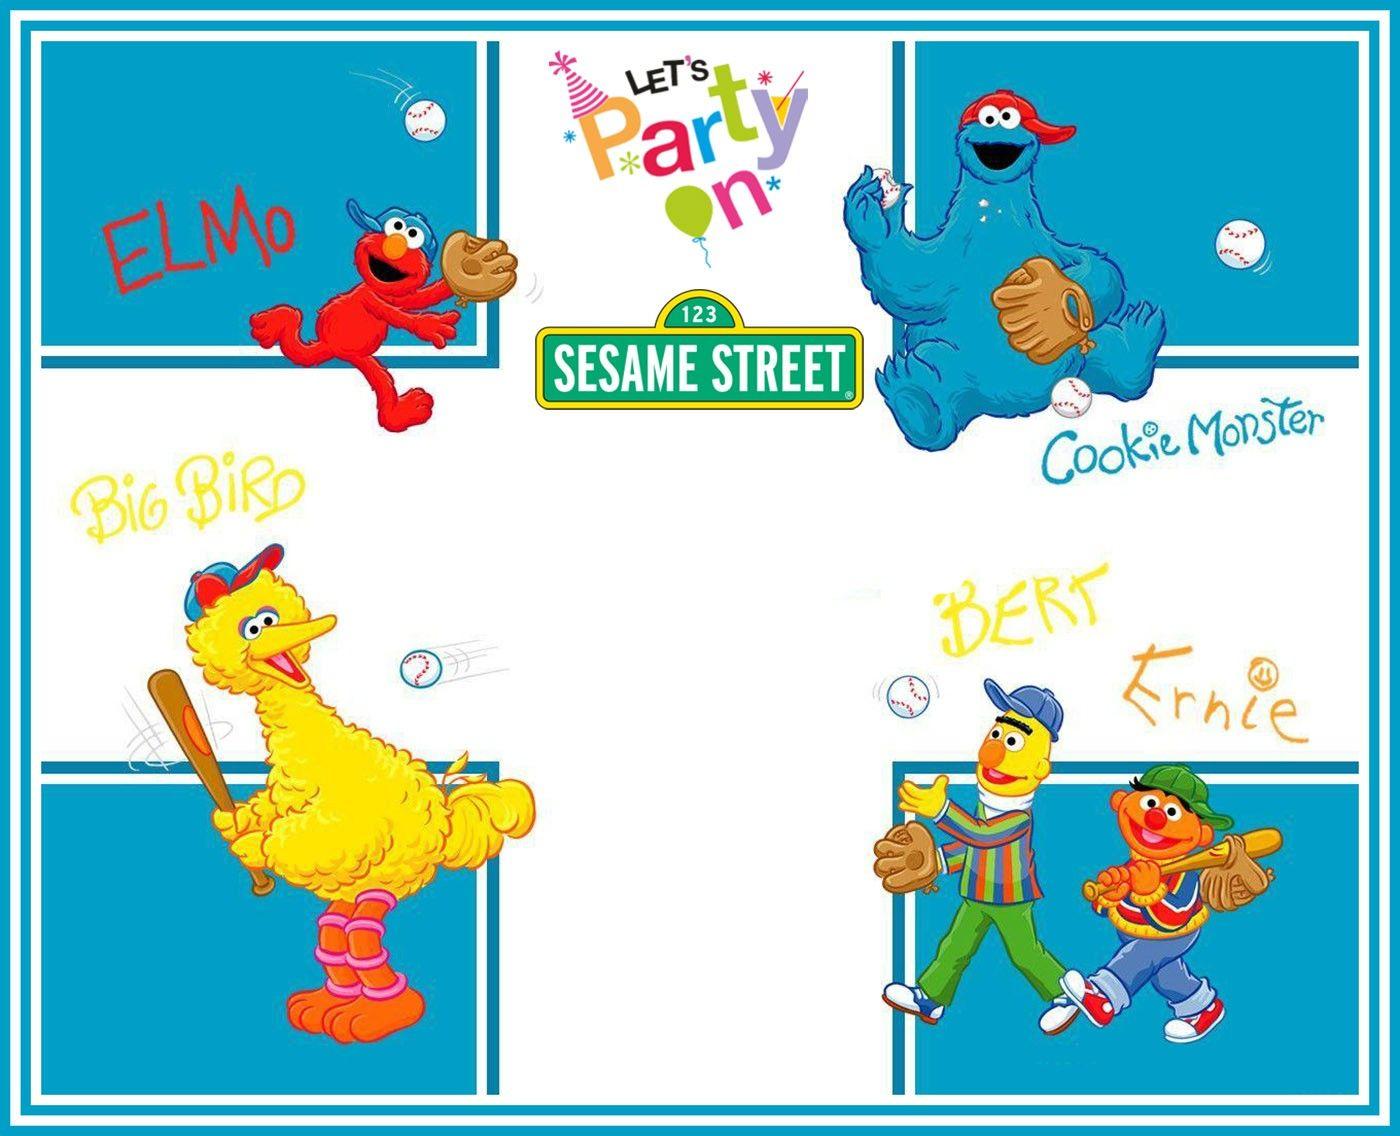 Free Printable Sesame Street Party Invitation Template | aniversario ...